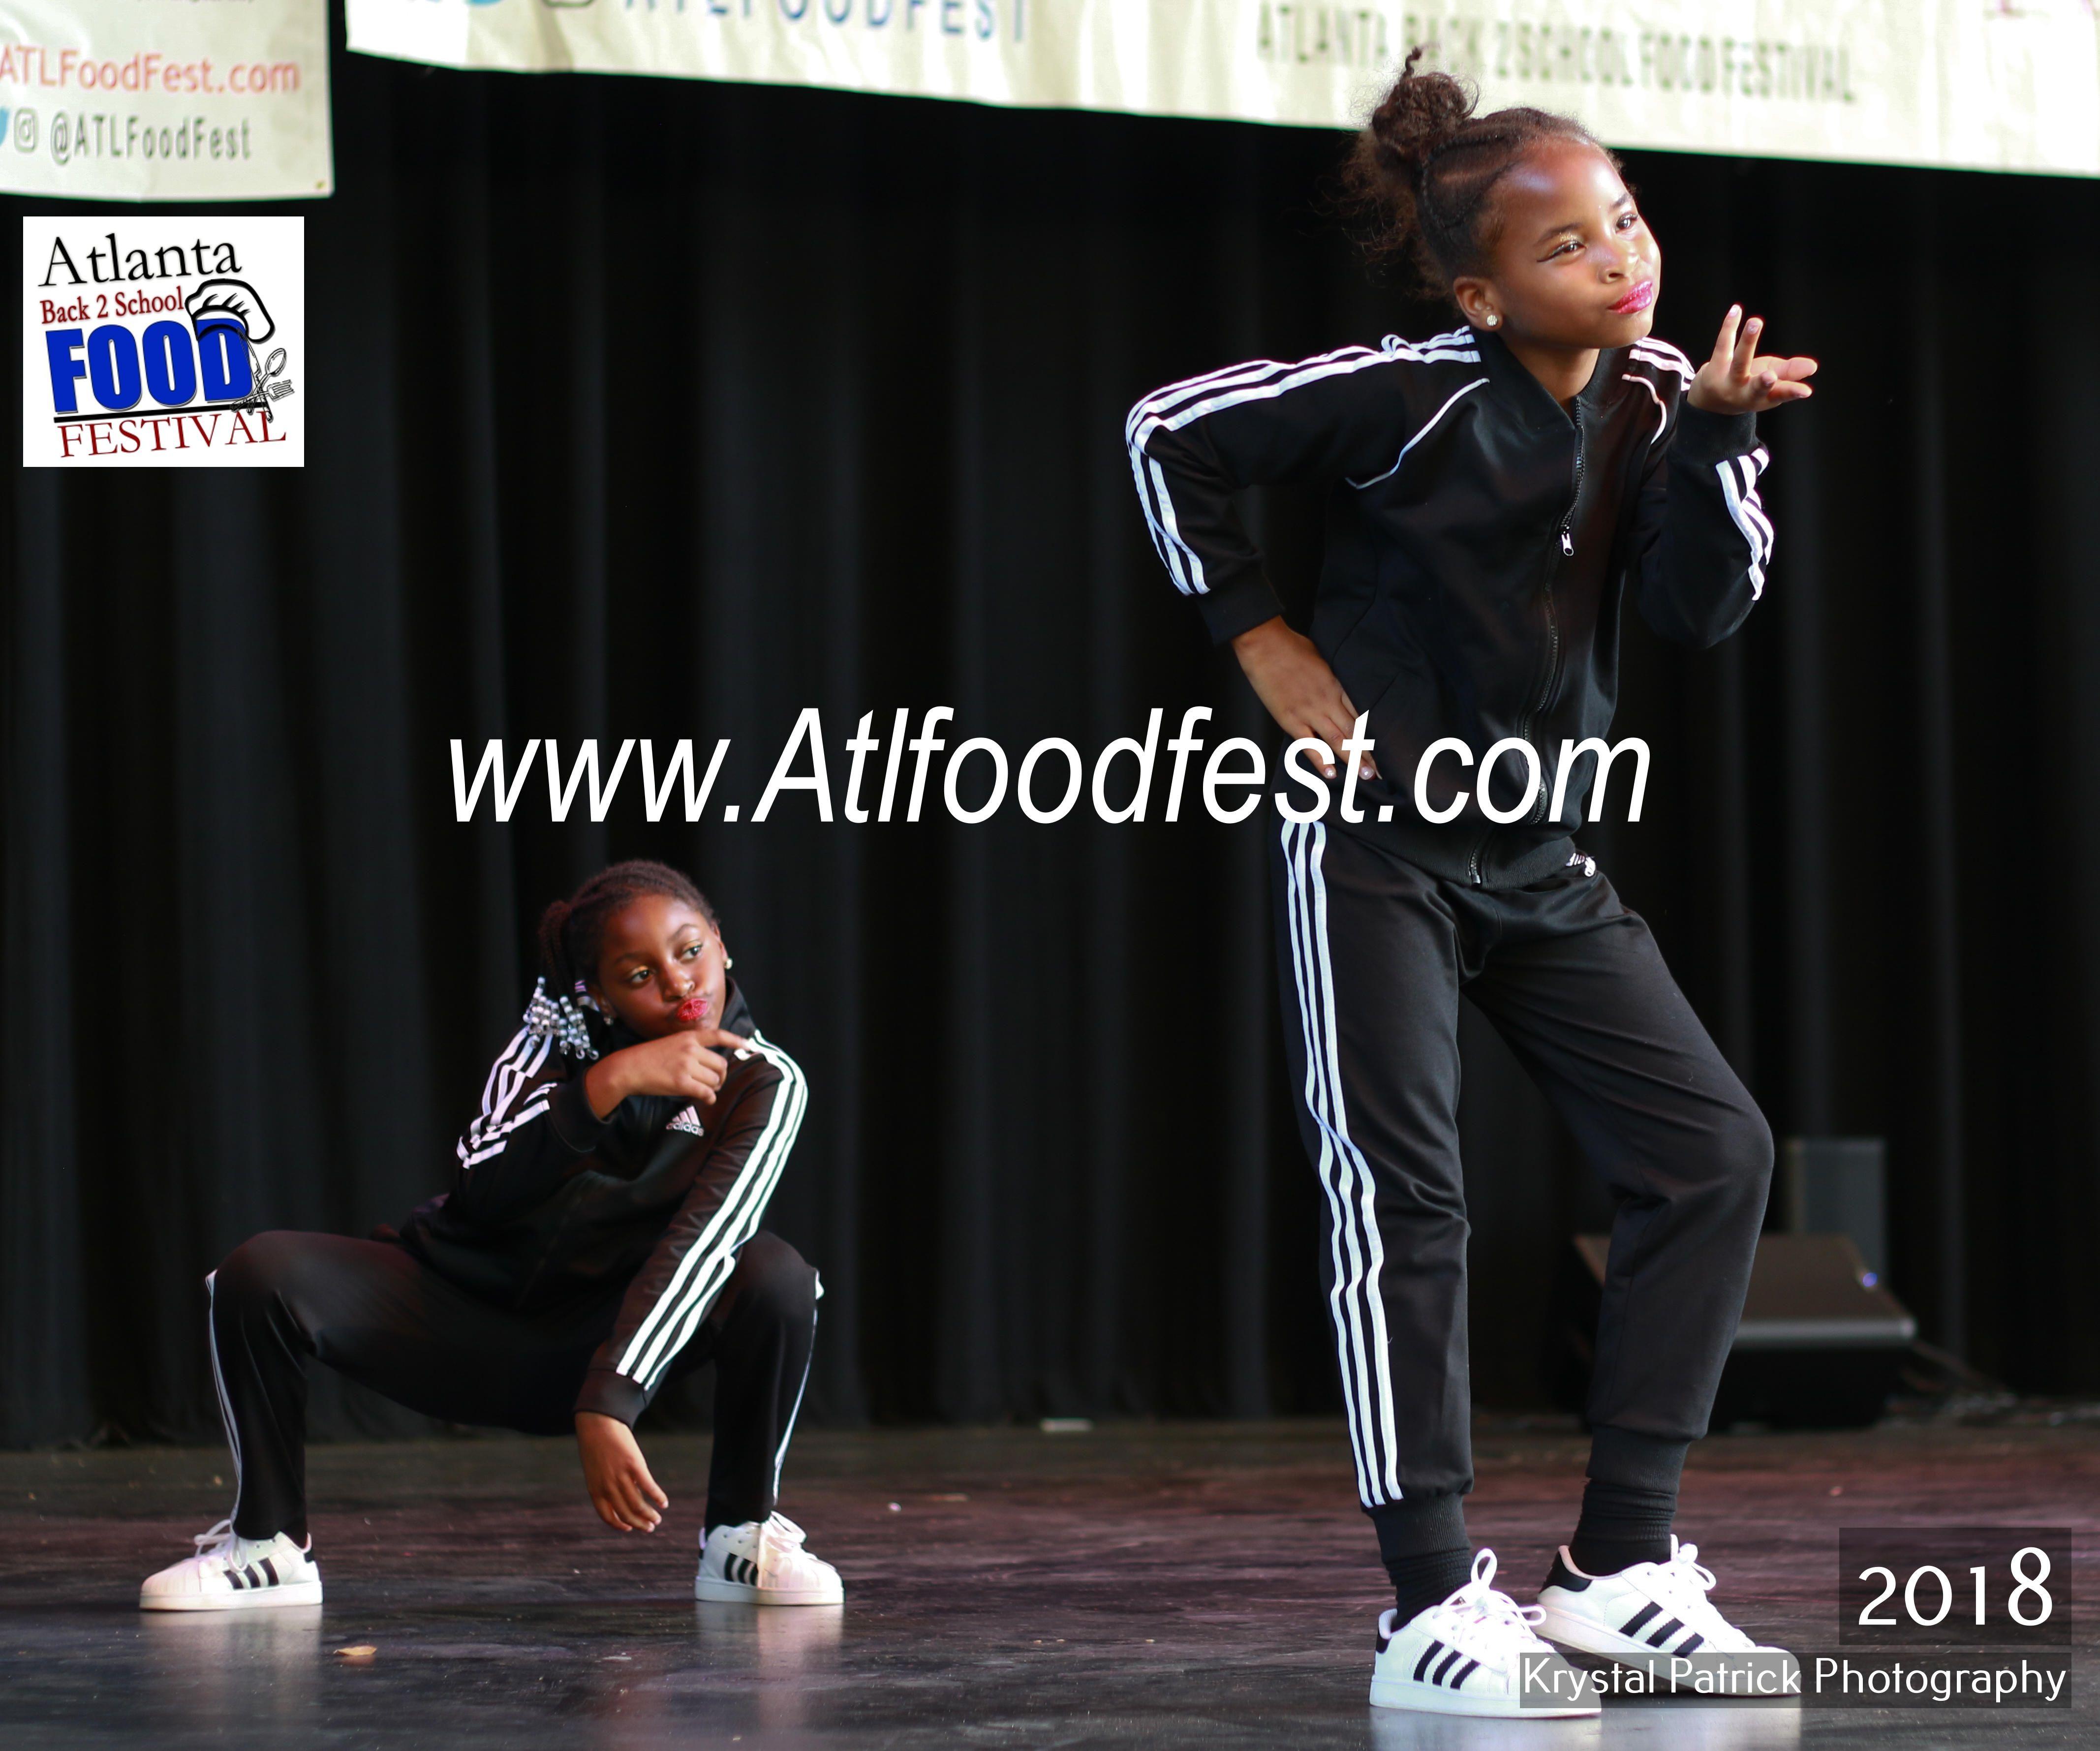 Atlanta Kids Dance Competition Host Professional Dancer Celebrity Choreographer Naeemah Mccowan Atlfoodfest The Festival Is Atlanta Festival Food Festival